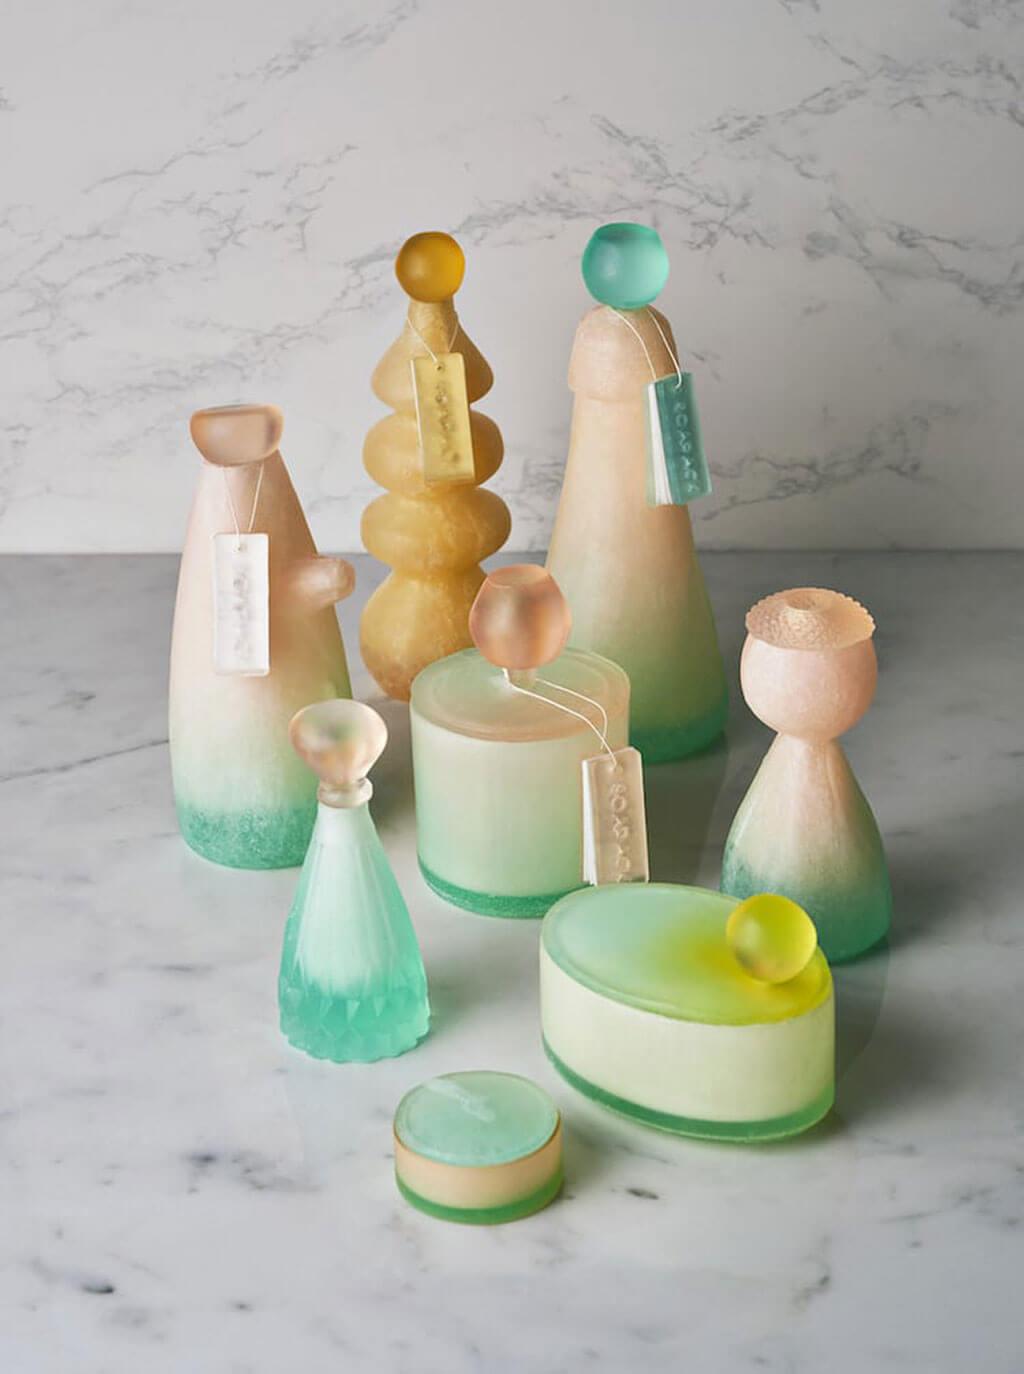 Mi Zhou's Soapack collection